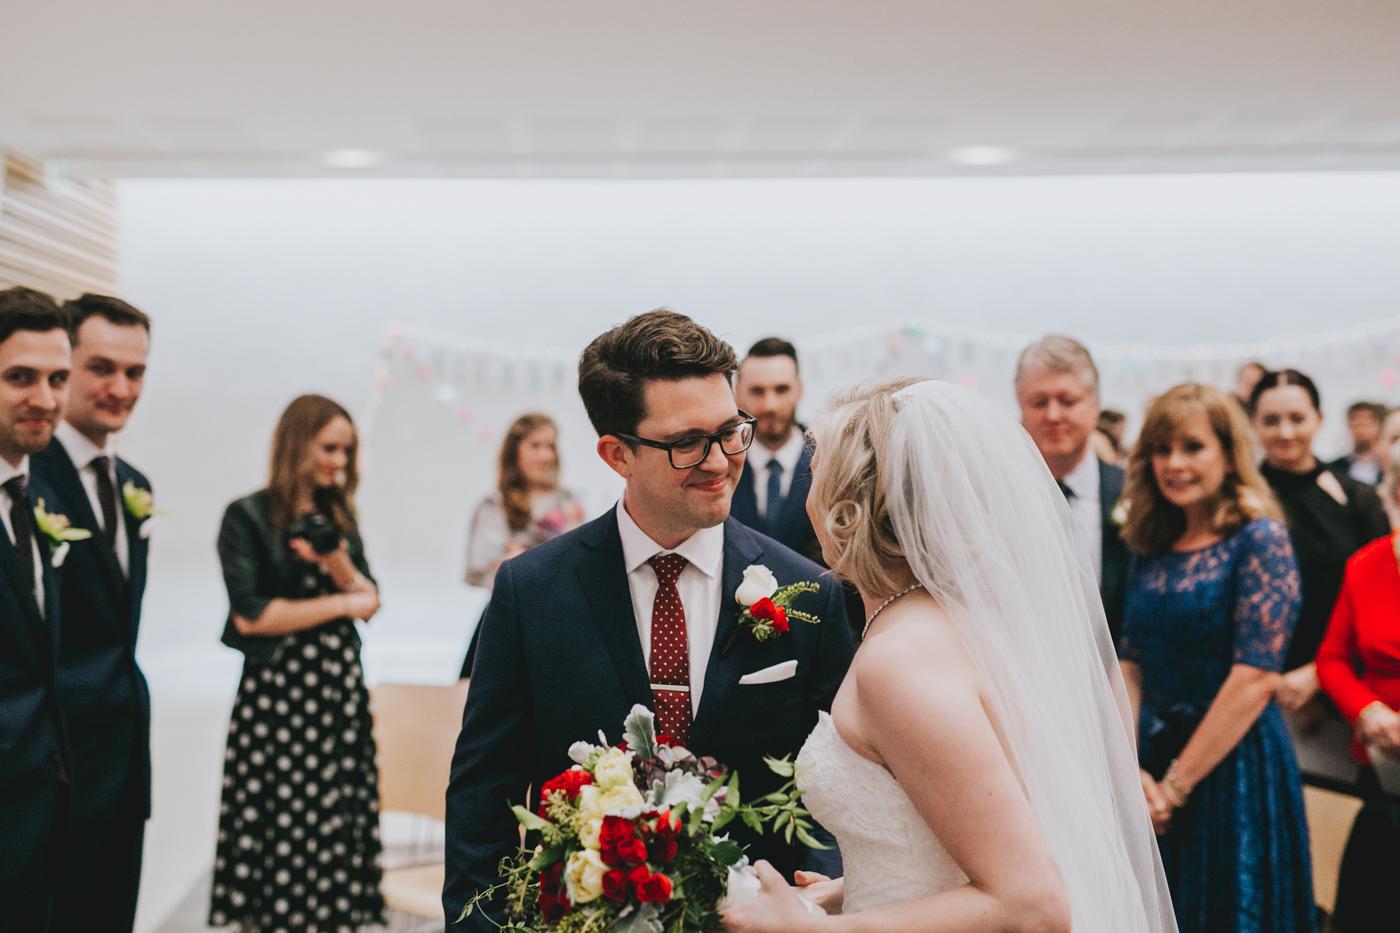 Jo & Tom Wedding - The Grounds of Alexandria - Samantha Heather Photography-100.jpg